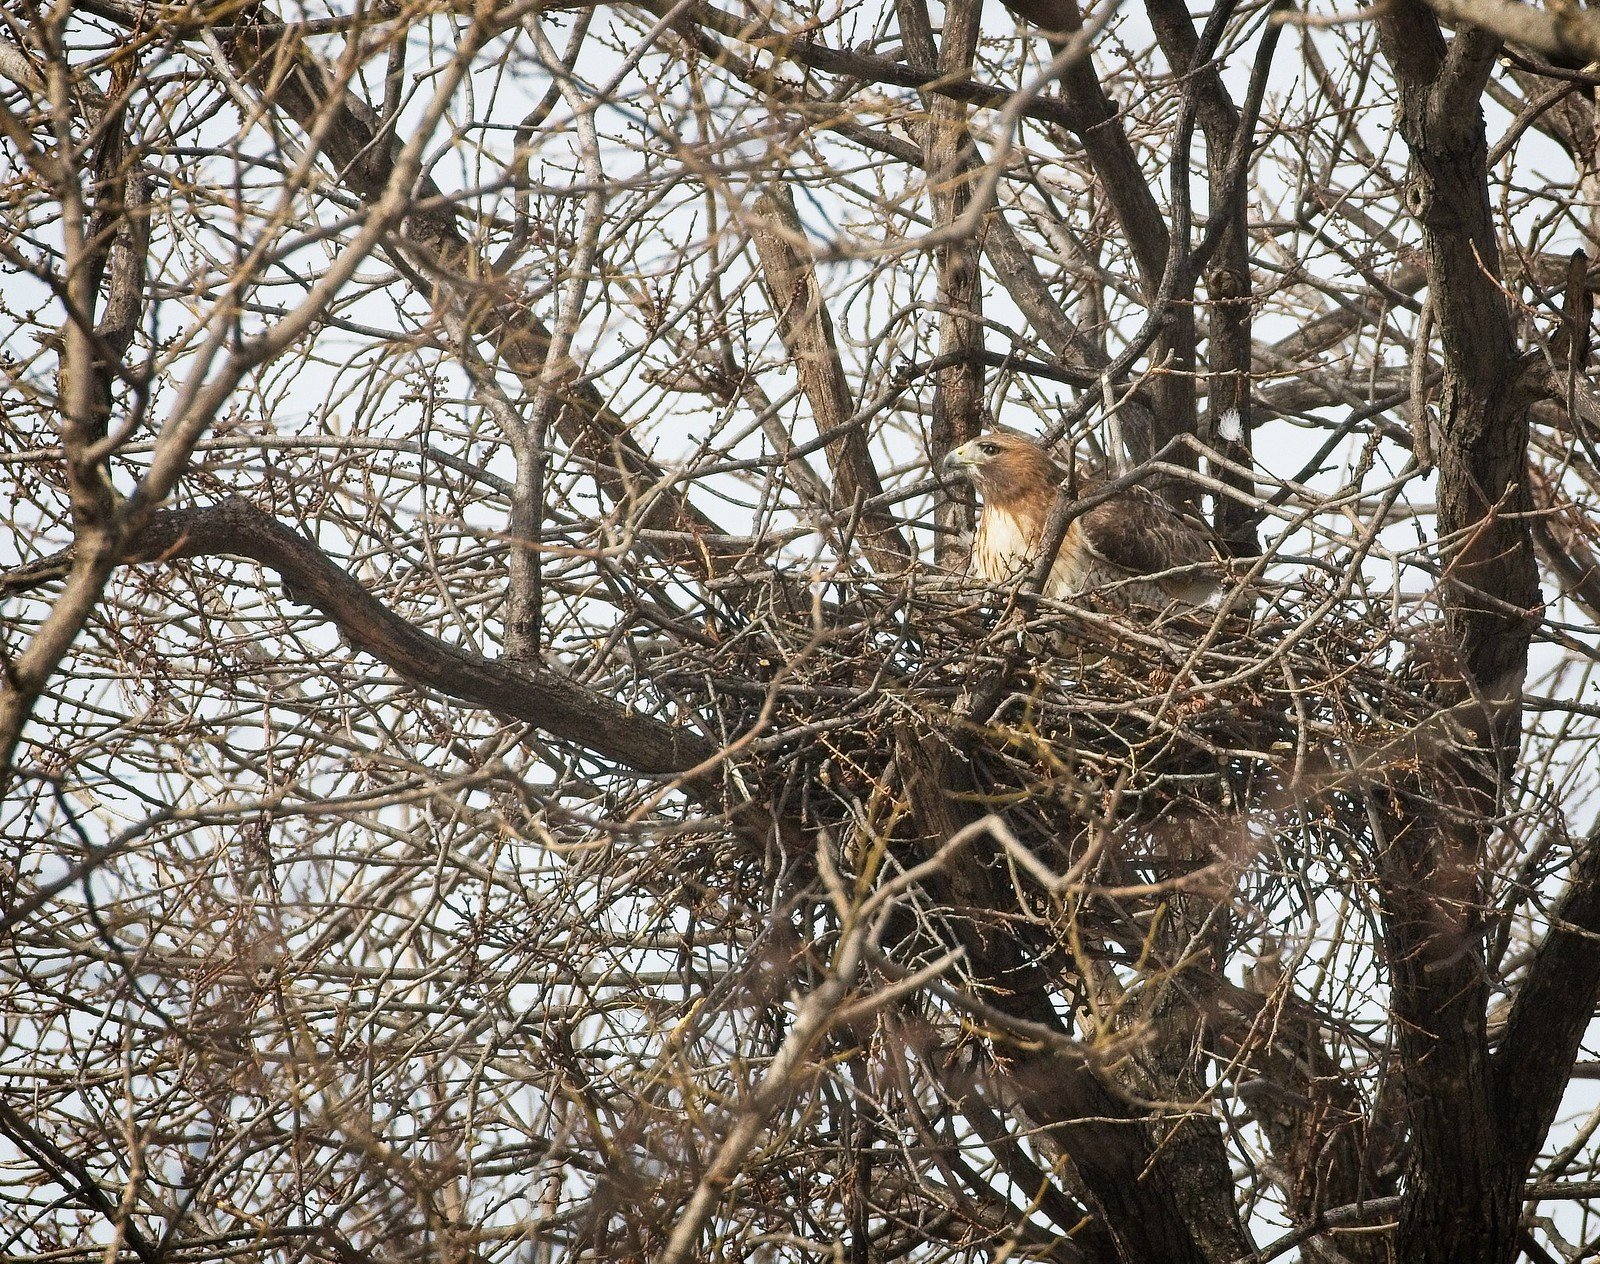 Amelia working on her nest